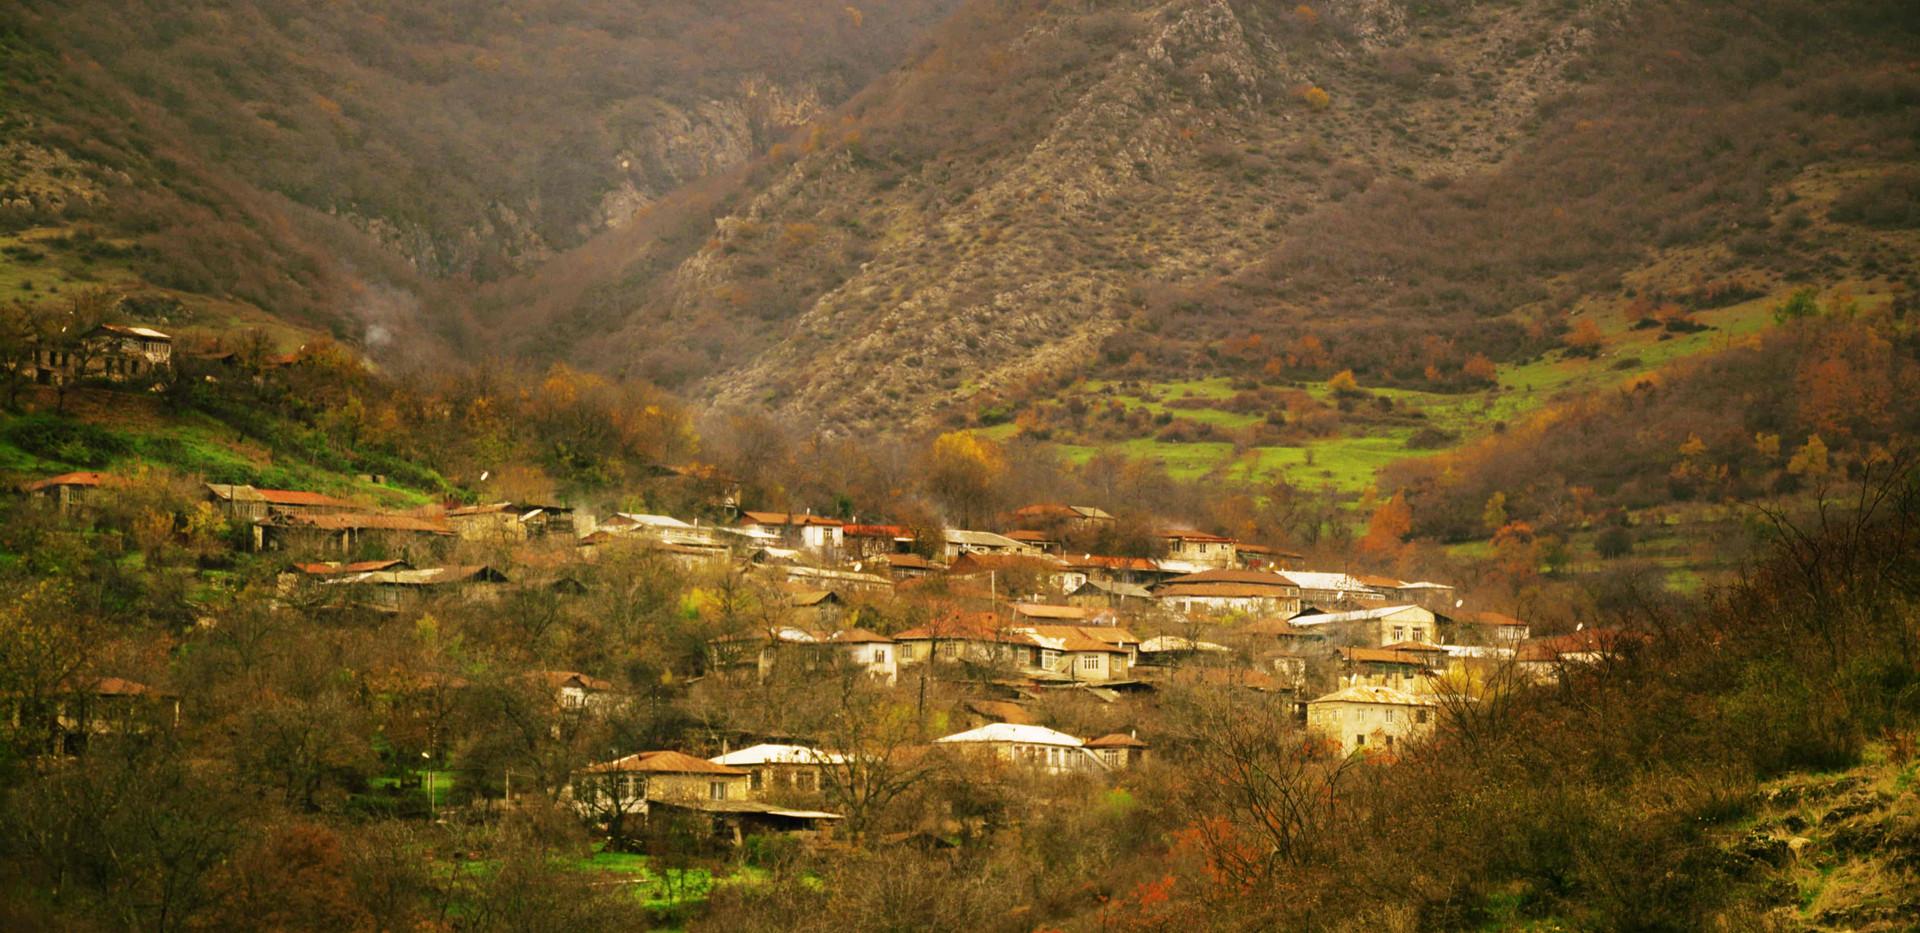 on the way to find Ararat's homestay in Azokh village